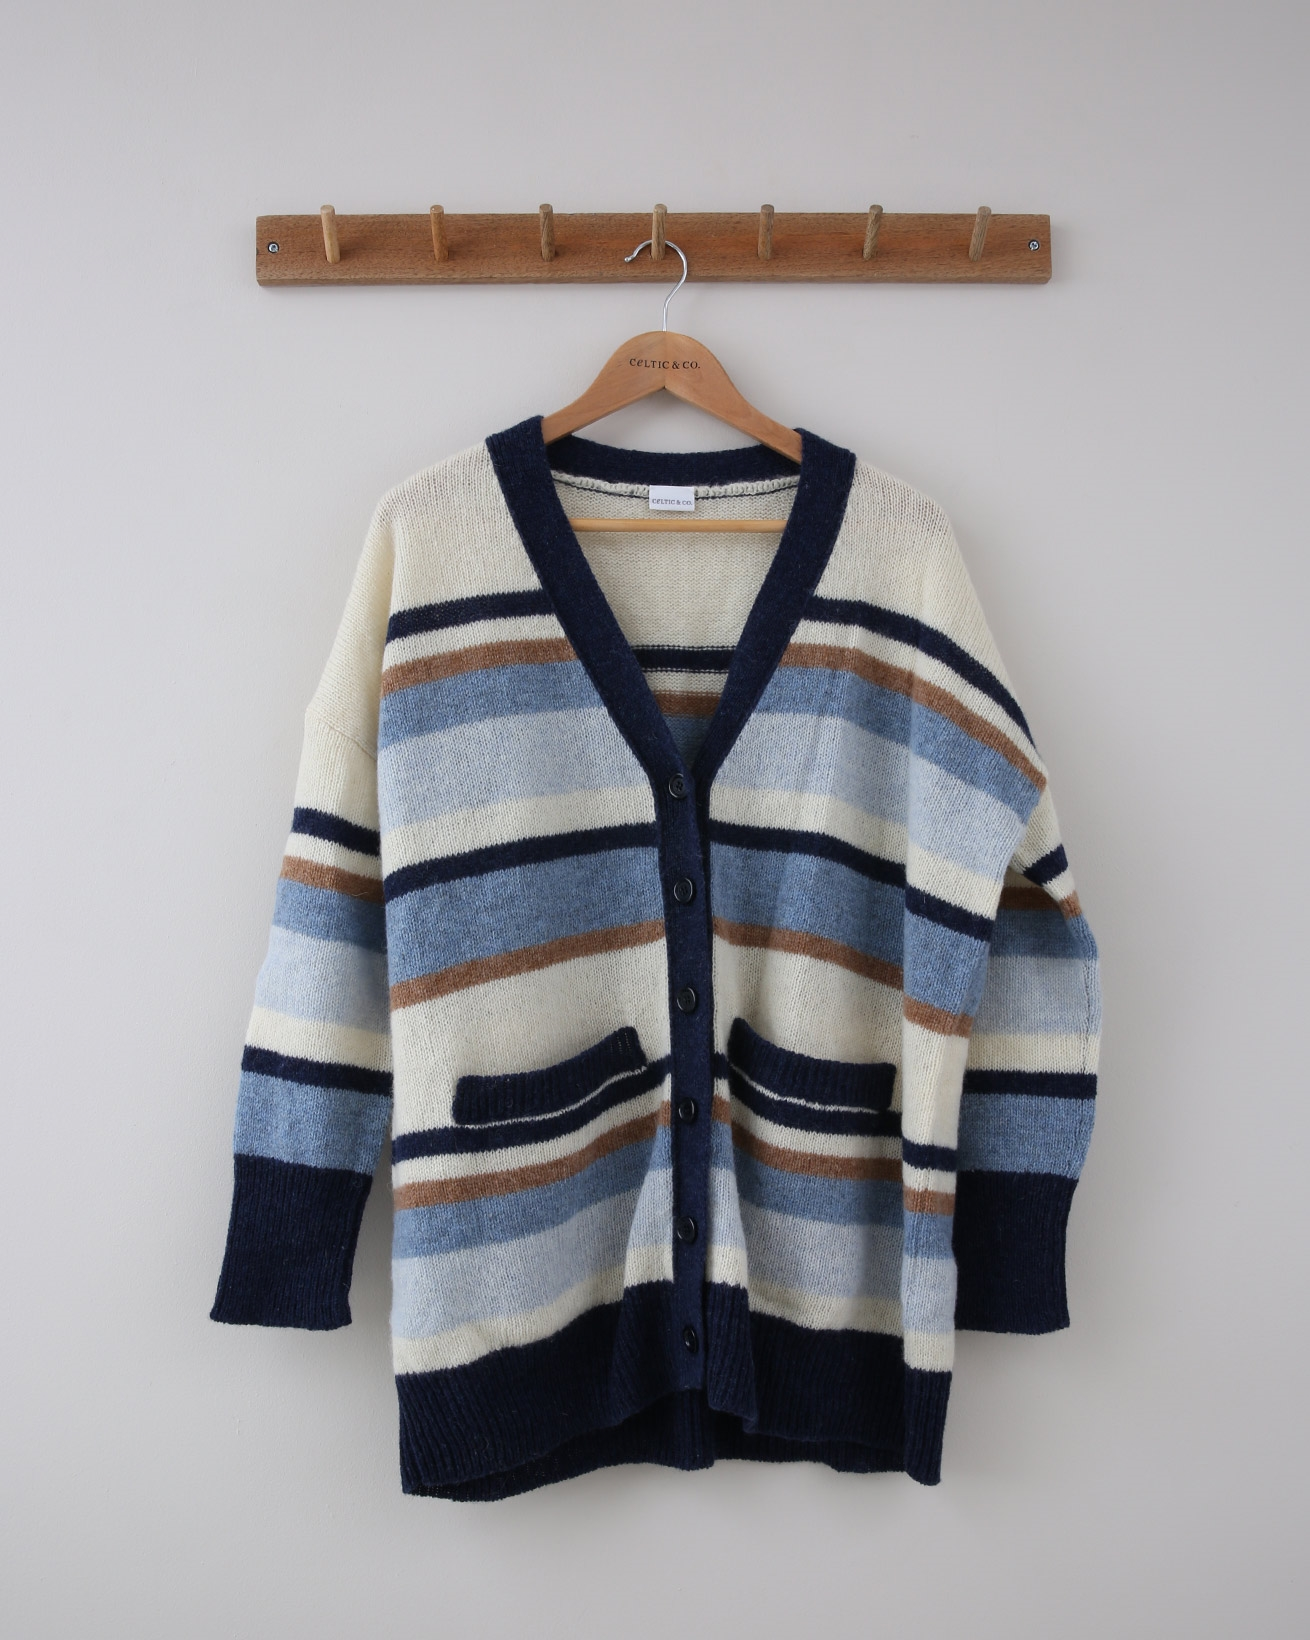 Varigated Stripe Boyfriend Cardigan - Medium - Blue & Cream Multi - 1385